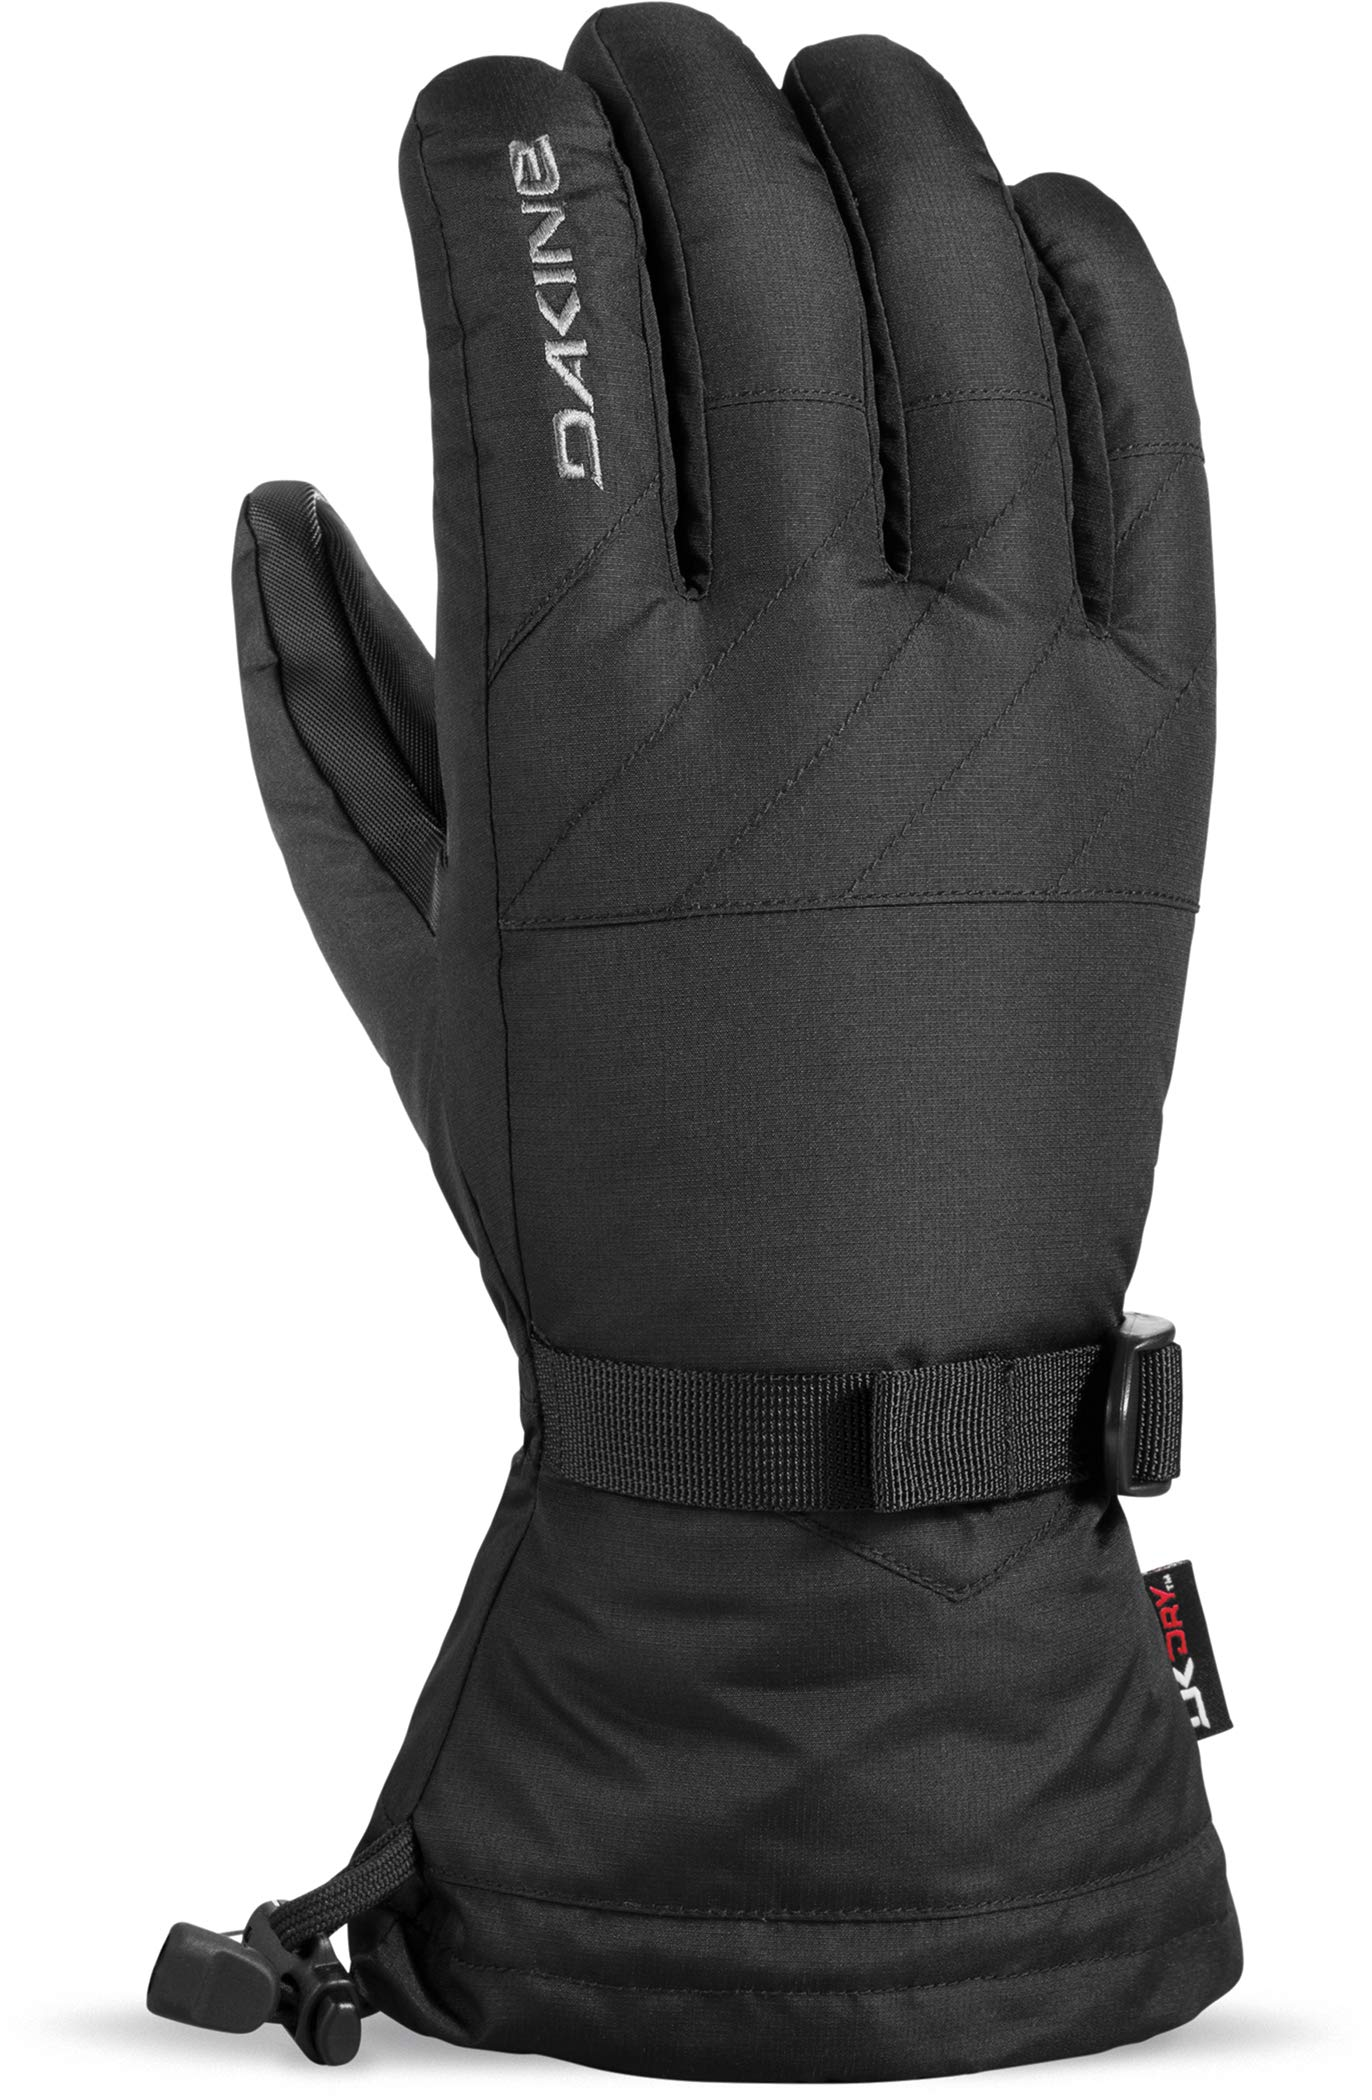 Dakine Men's Talon Glove, Black, Medium by Dakine